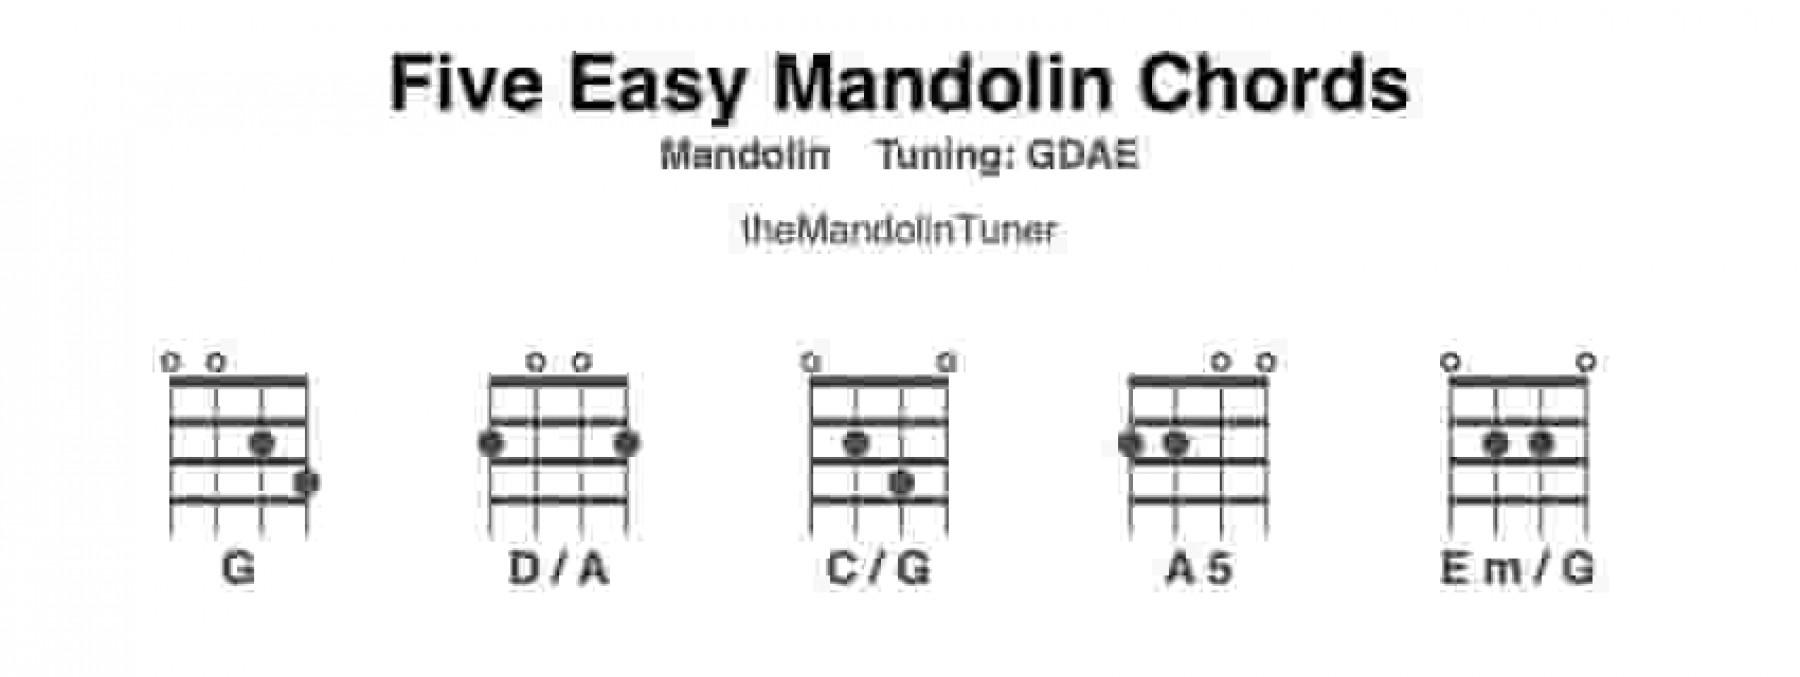 Five-Easy-Mandolin-Chords